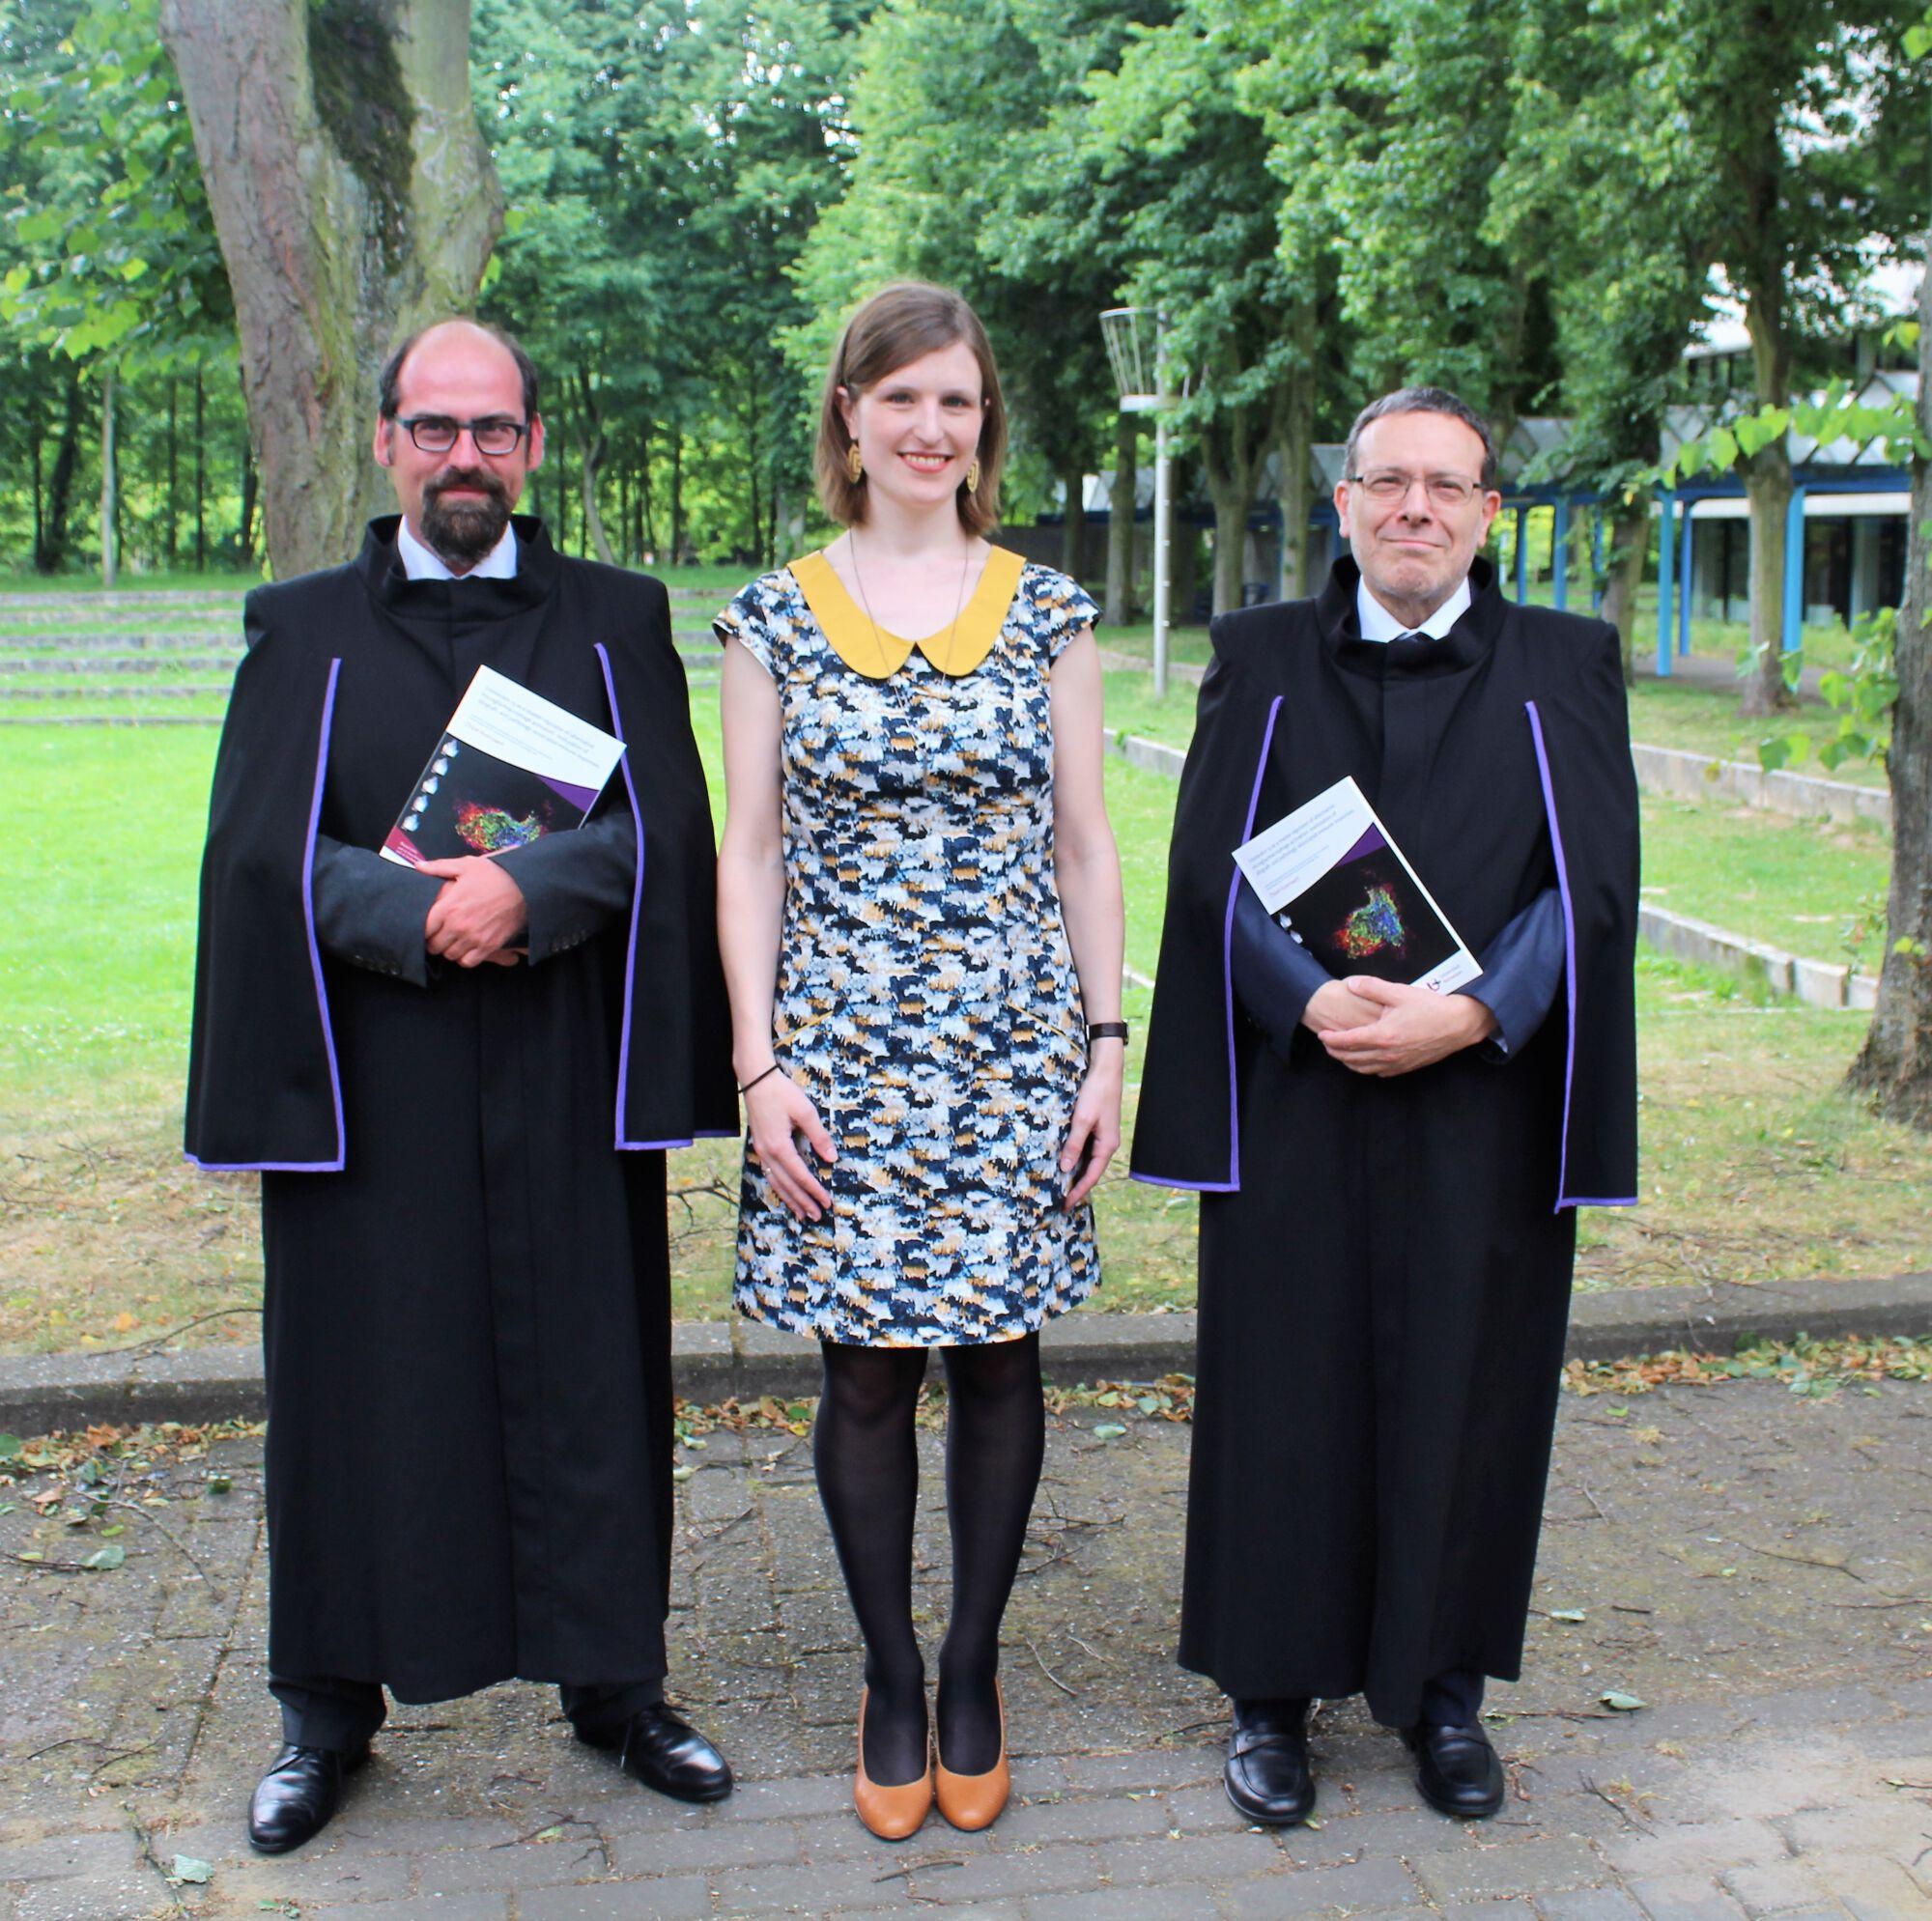 Doctoraatsverdediging Chloé Hoornaert - 8 juni 2017